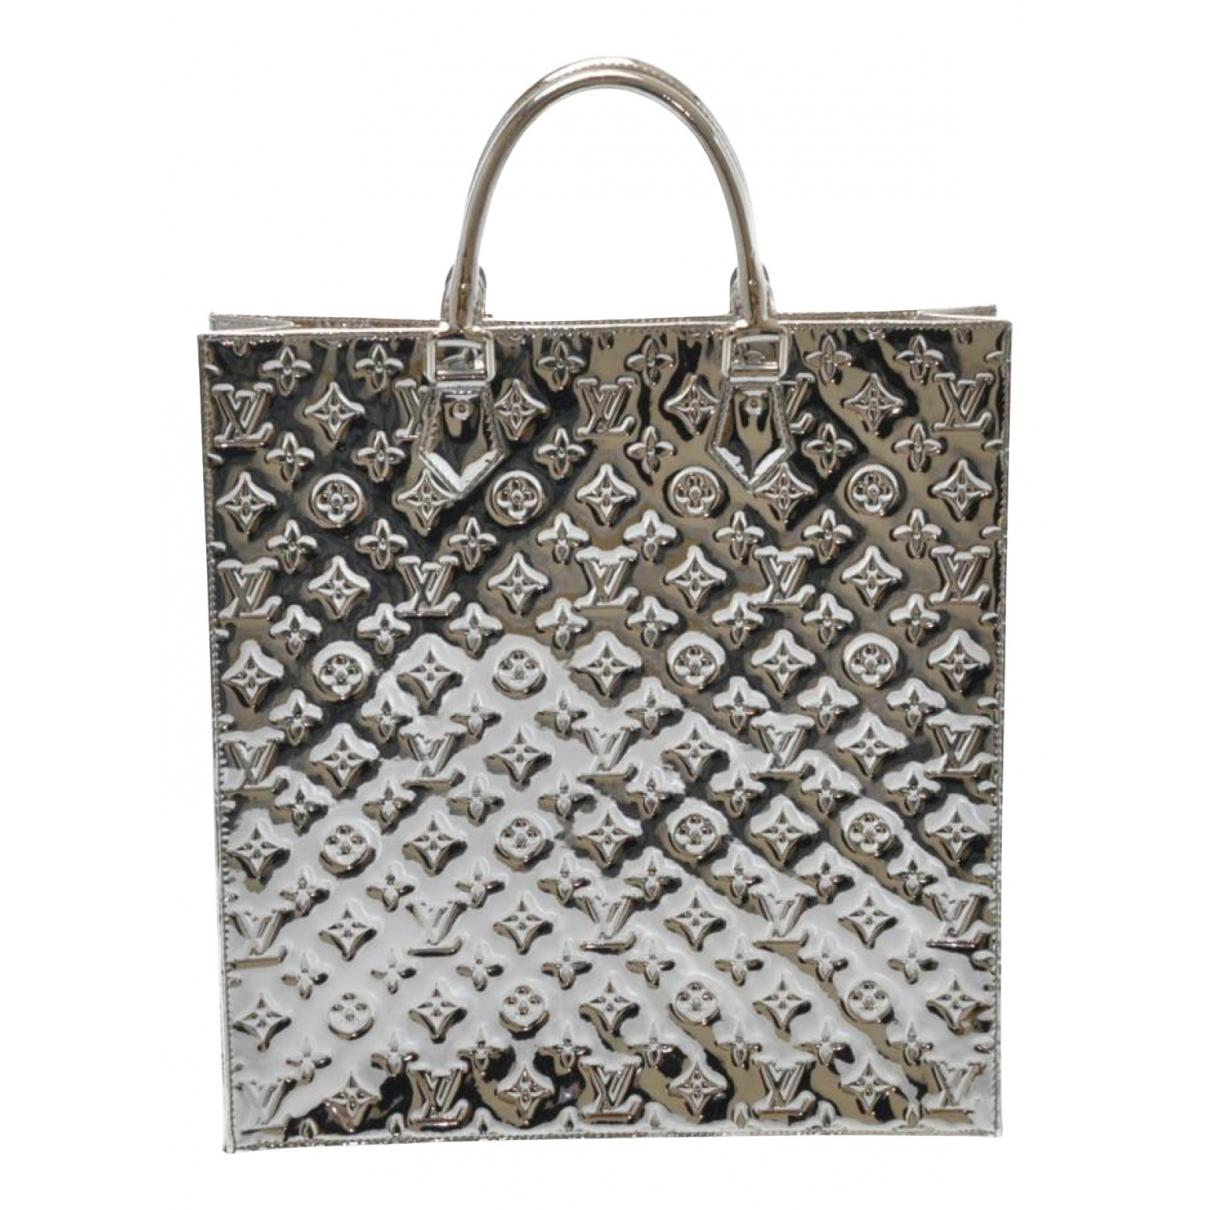 Louis Vuitton Plat Handtasche in  Silber Lackleder